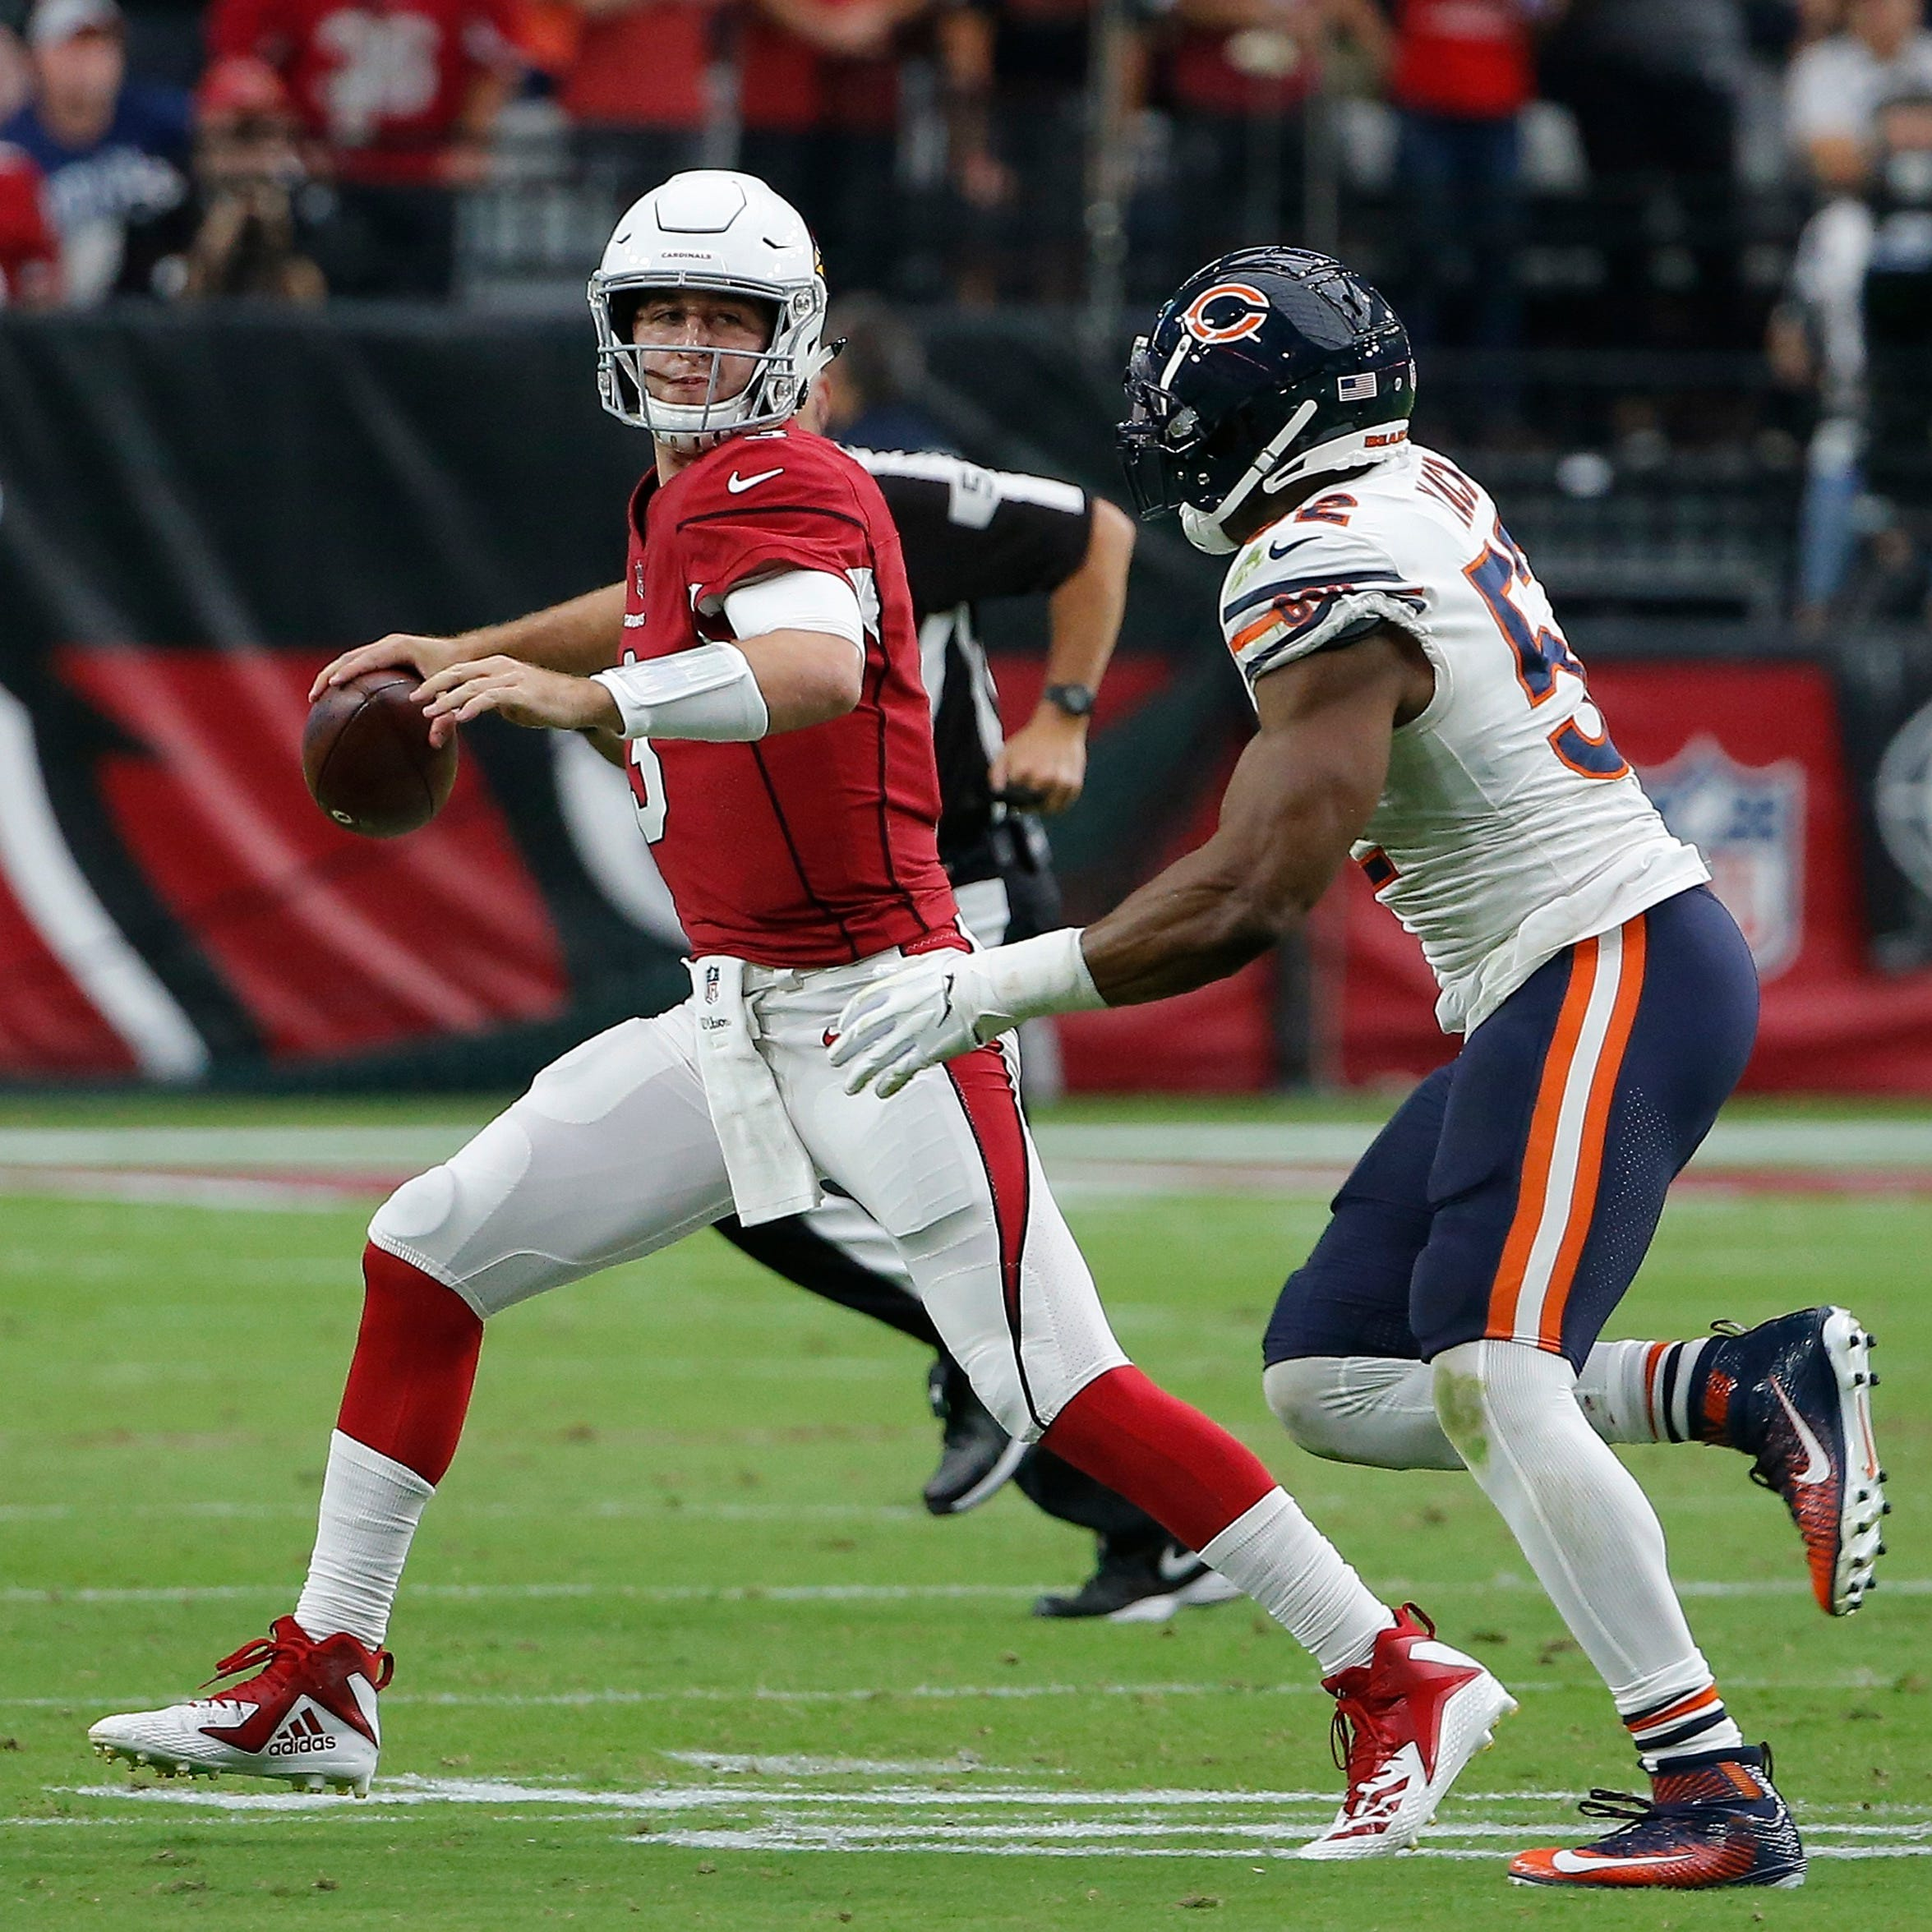 Instant replay: Arizona Cardinals fall to Chicago Bears in Josh Rosen's debut